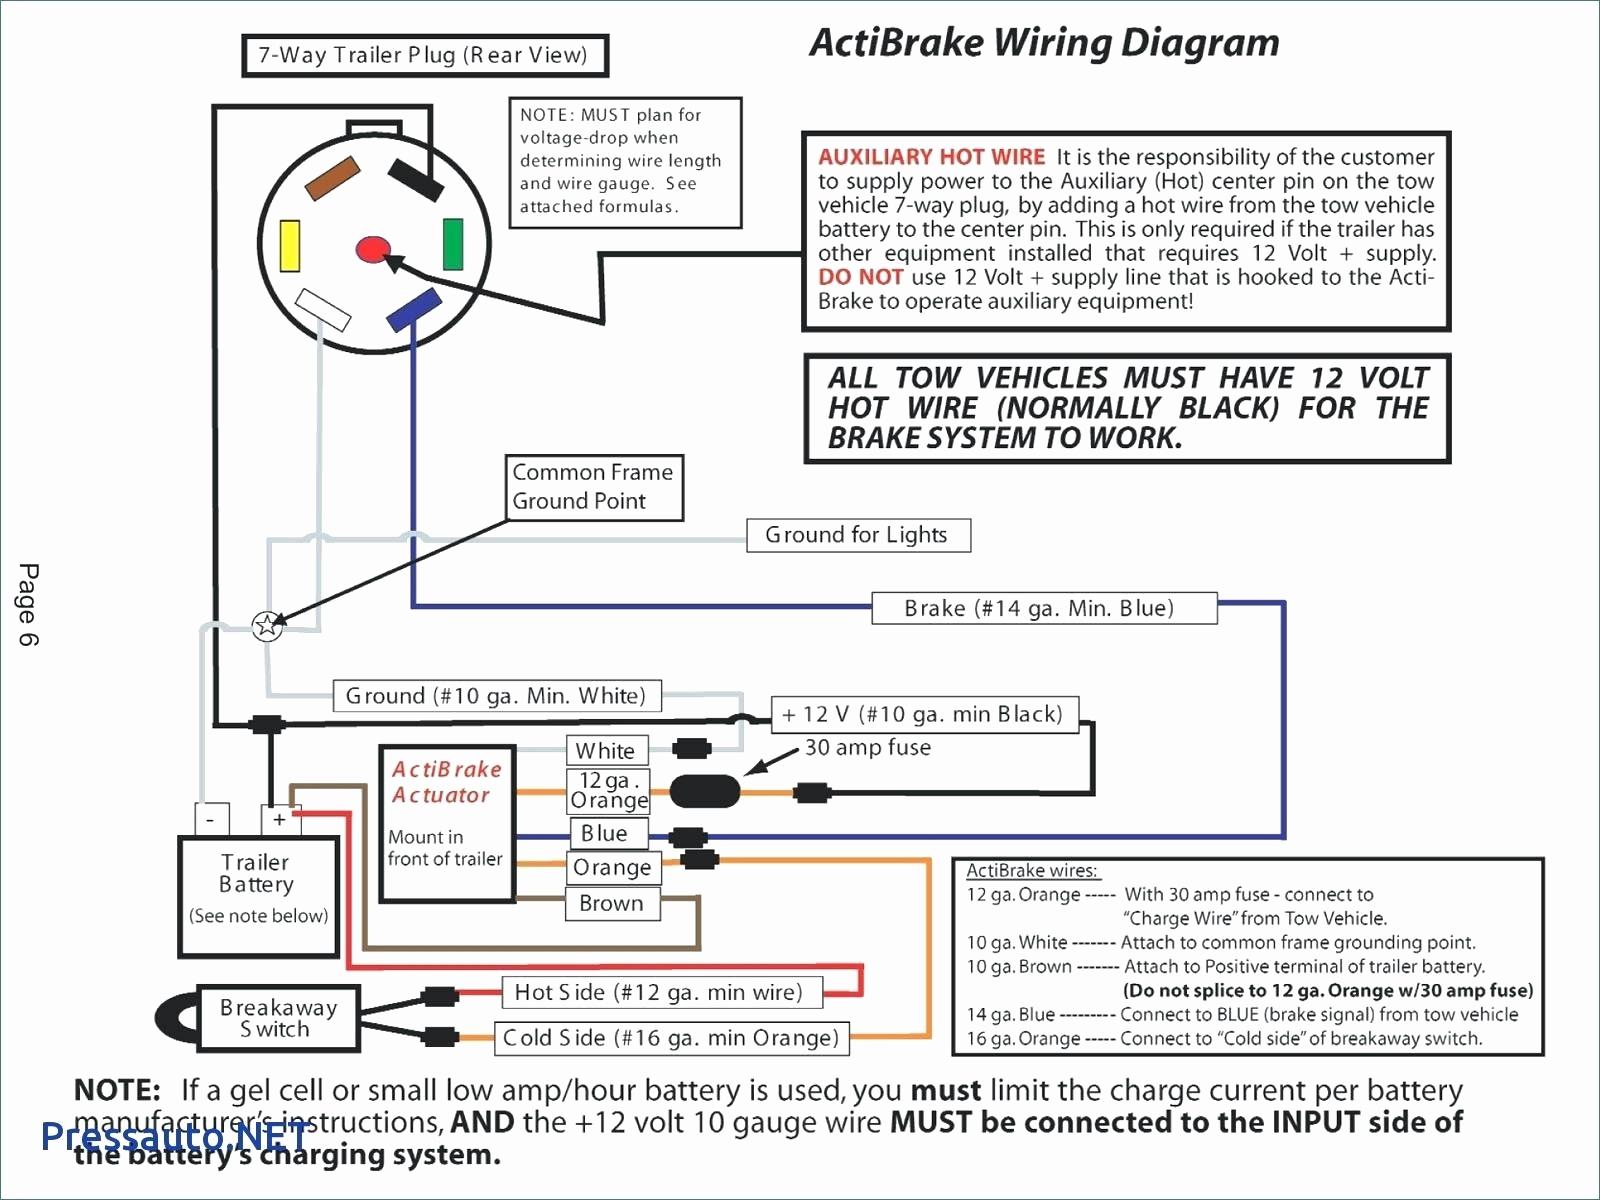 16Pin Kenwood Kdc 248U Wiring Harness Diagram   Manual E-Books - Kenwood 16 Pin Wiring Harness Diagram